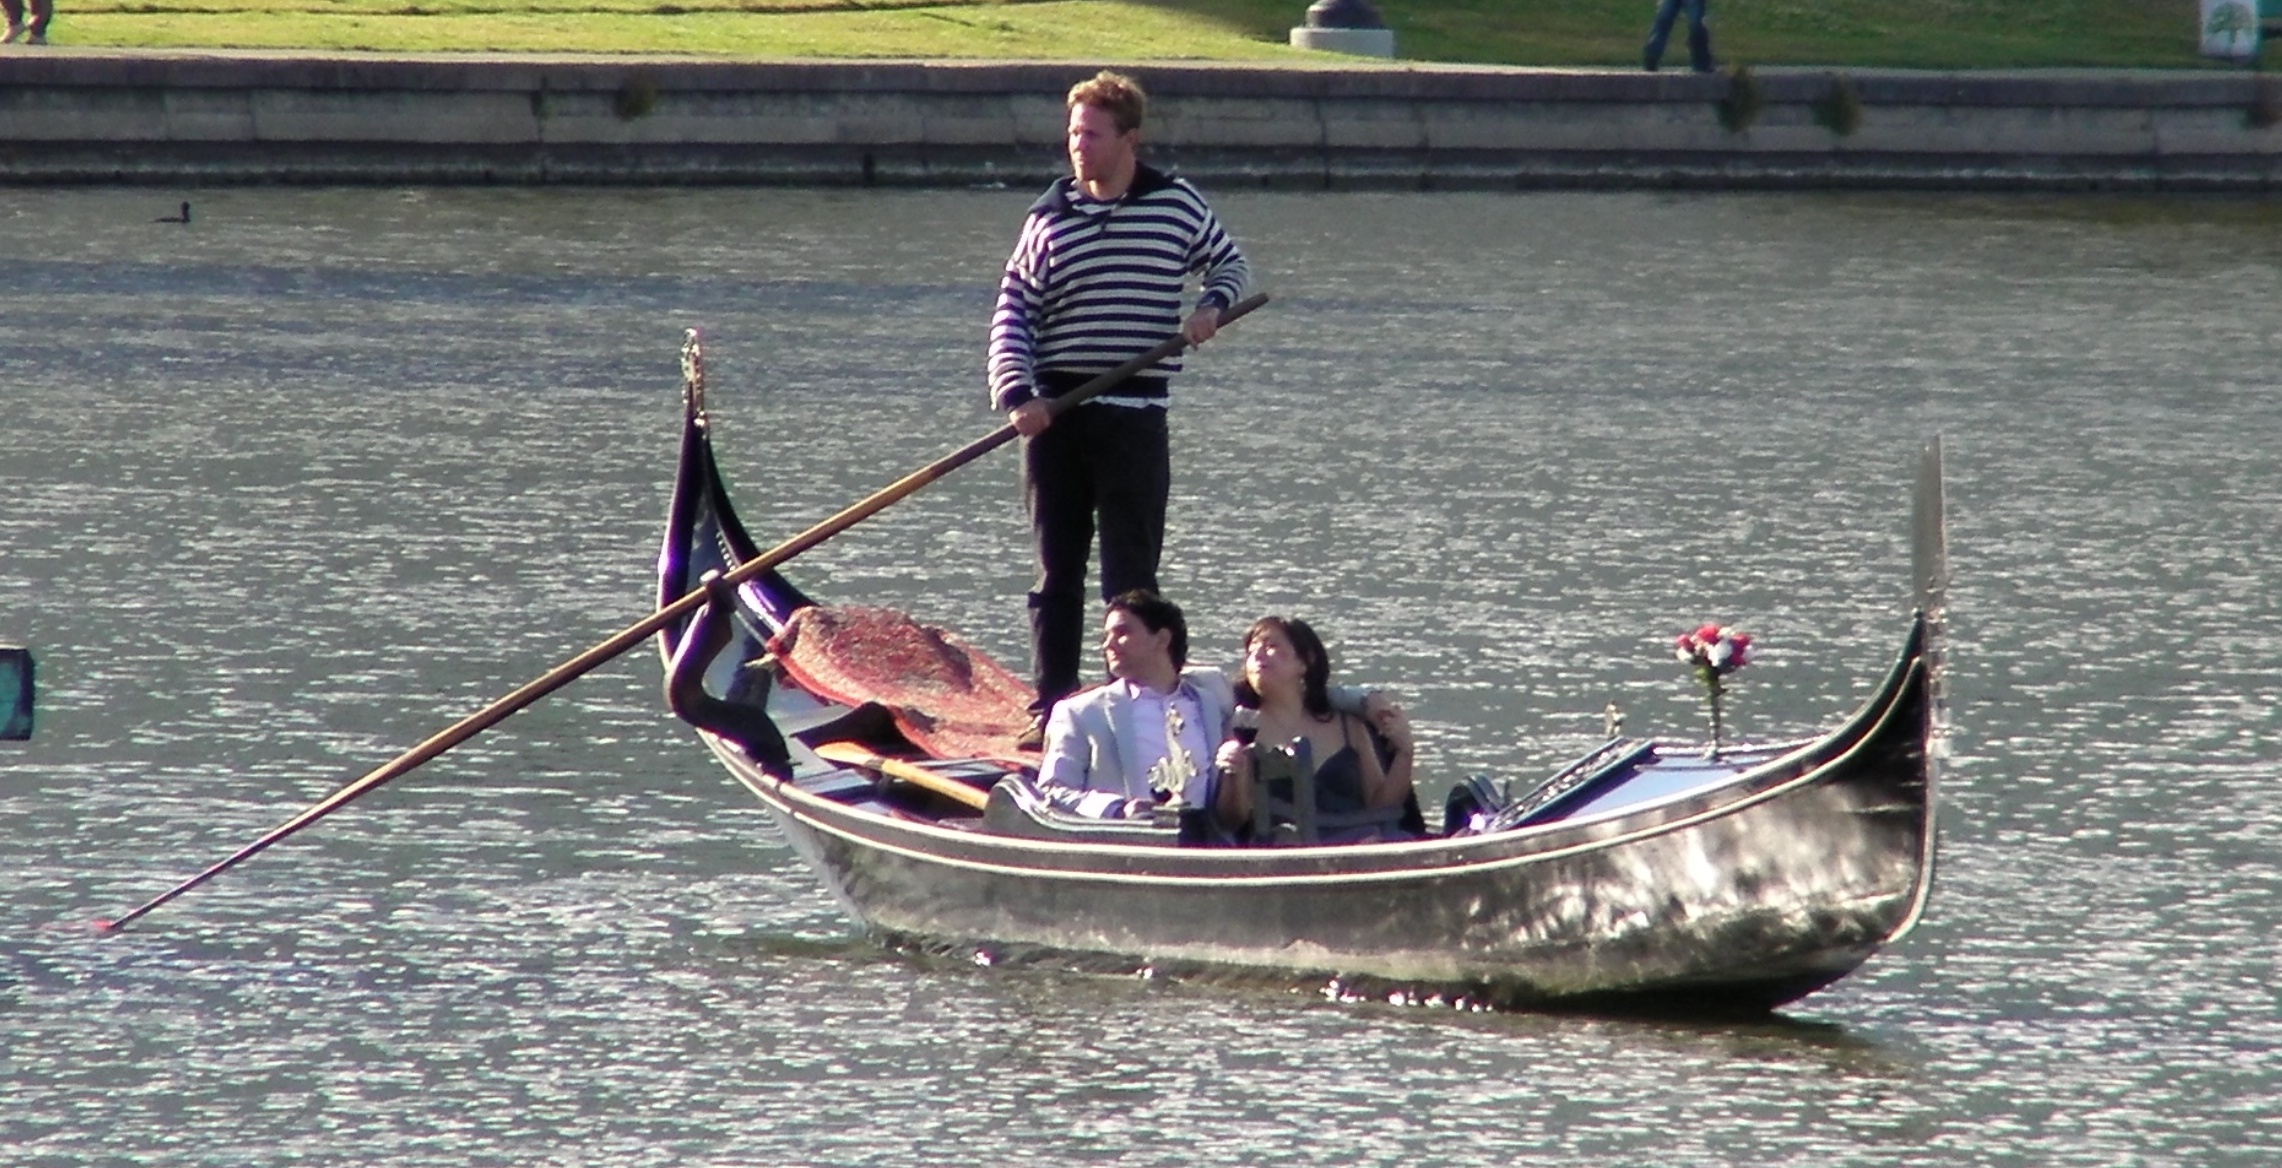 Gondola on Lake Merritt